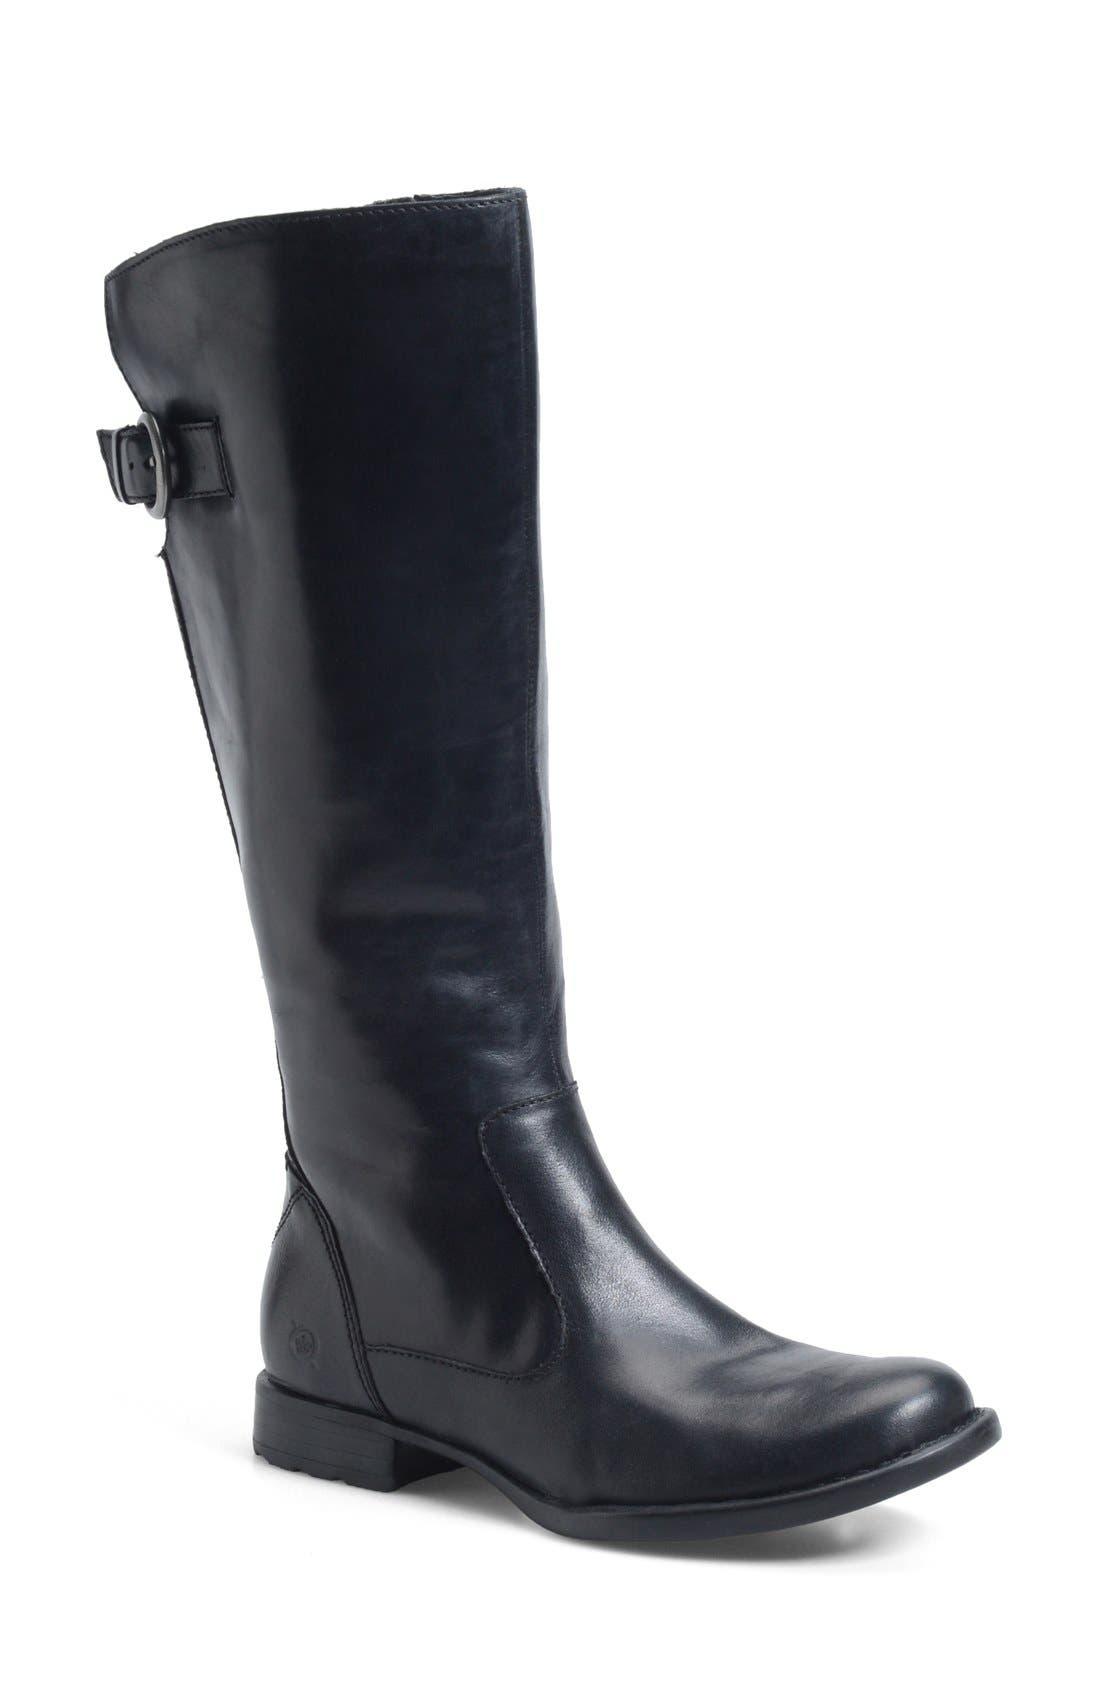 Main Image - Børn 'Lottie' Round Toe Boot (Women)